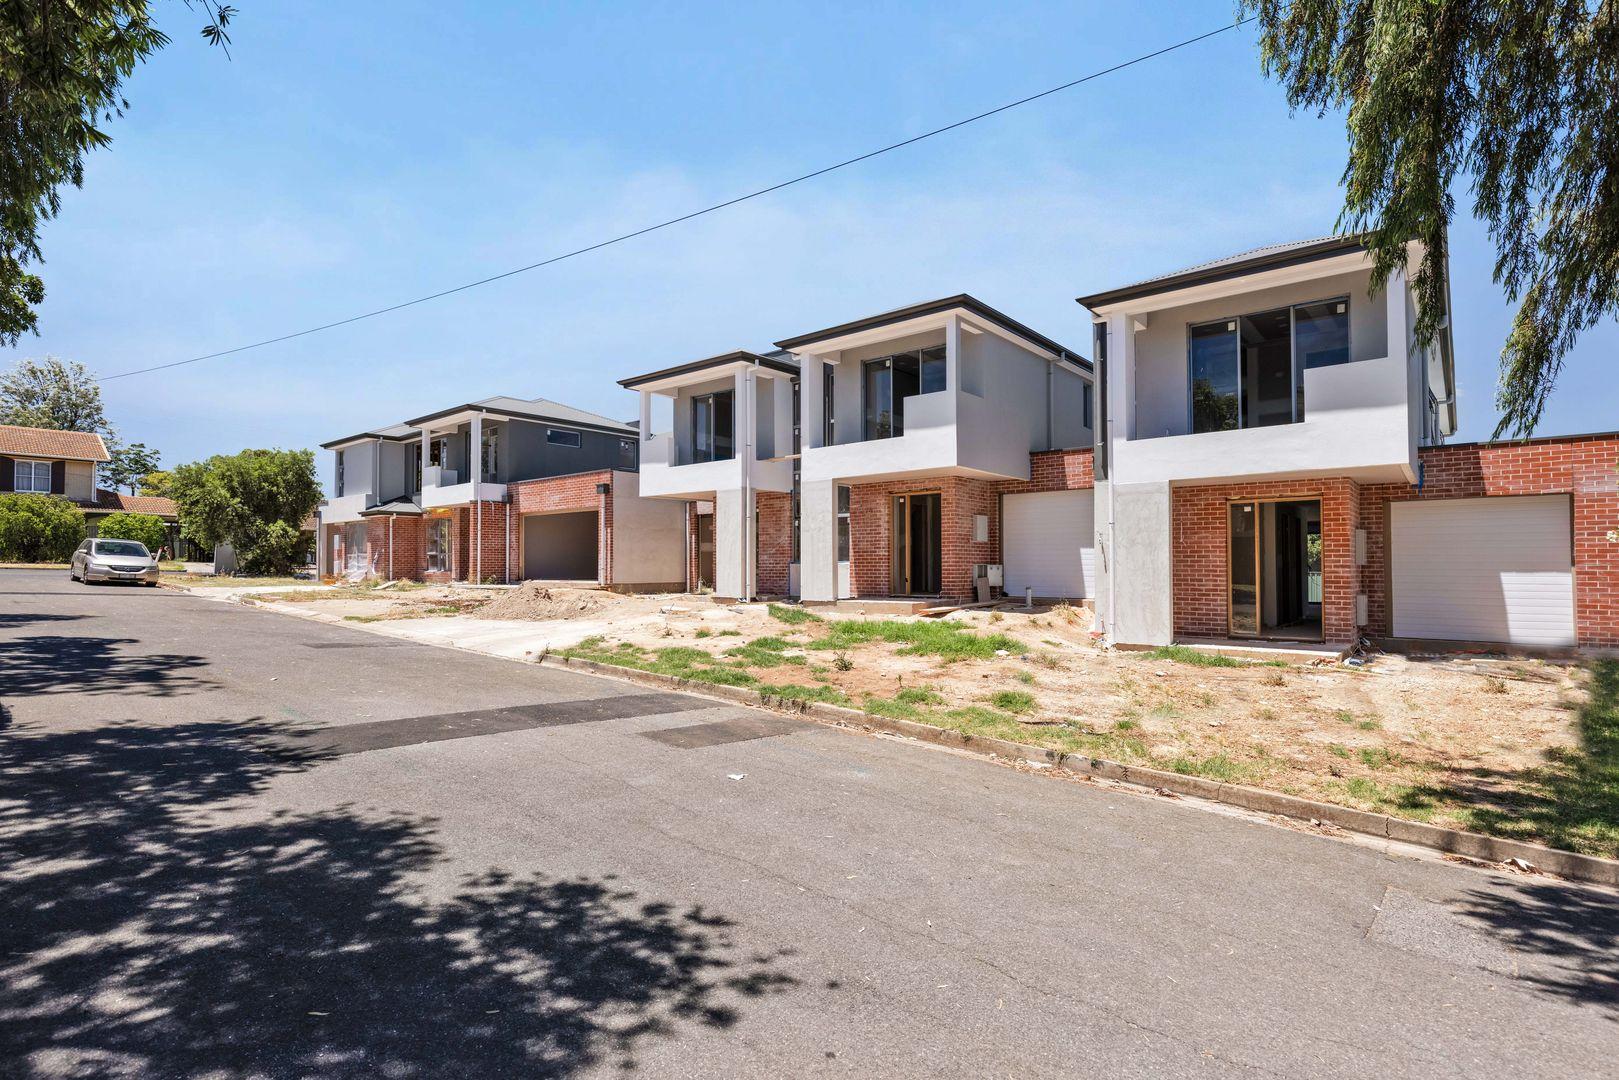 2-4 Hillside Drive, Campbelltown SA 5074, Image 0